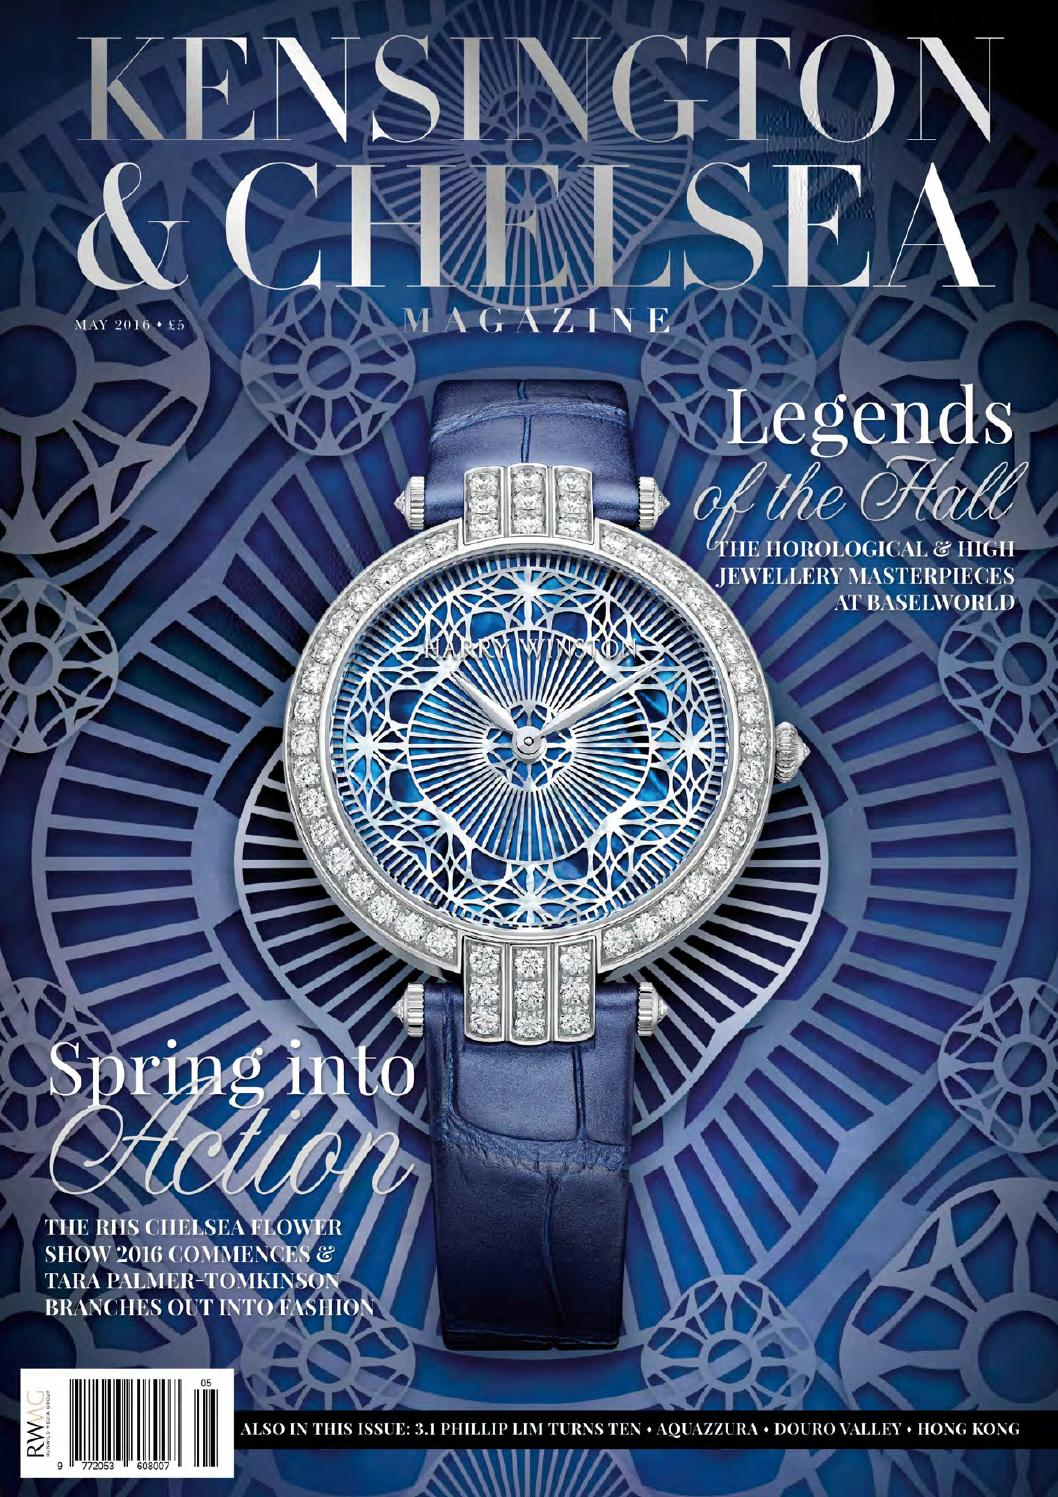 The Kensington u0026 Chelsea Magazine May 2016